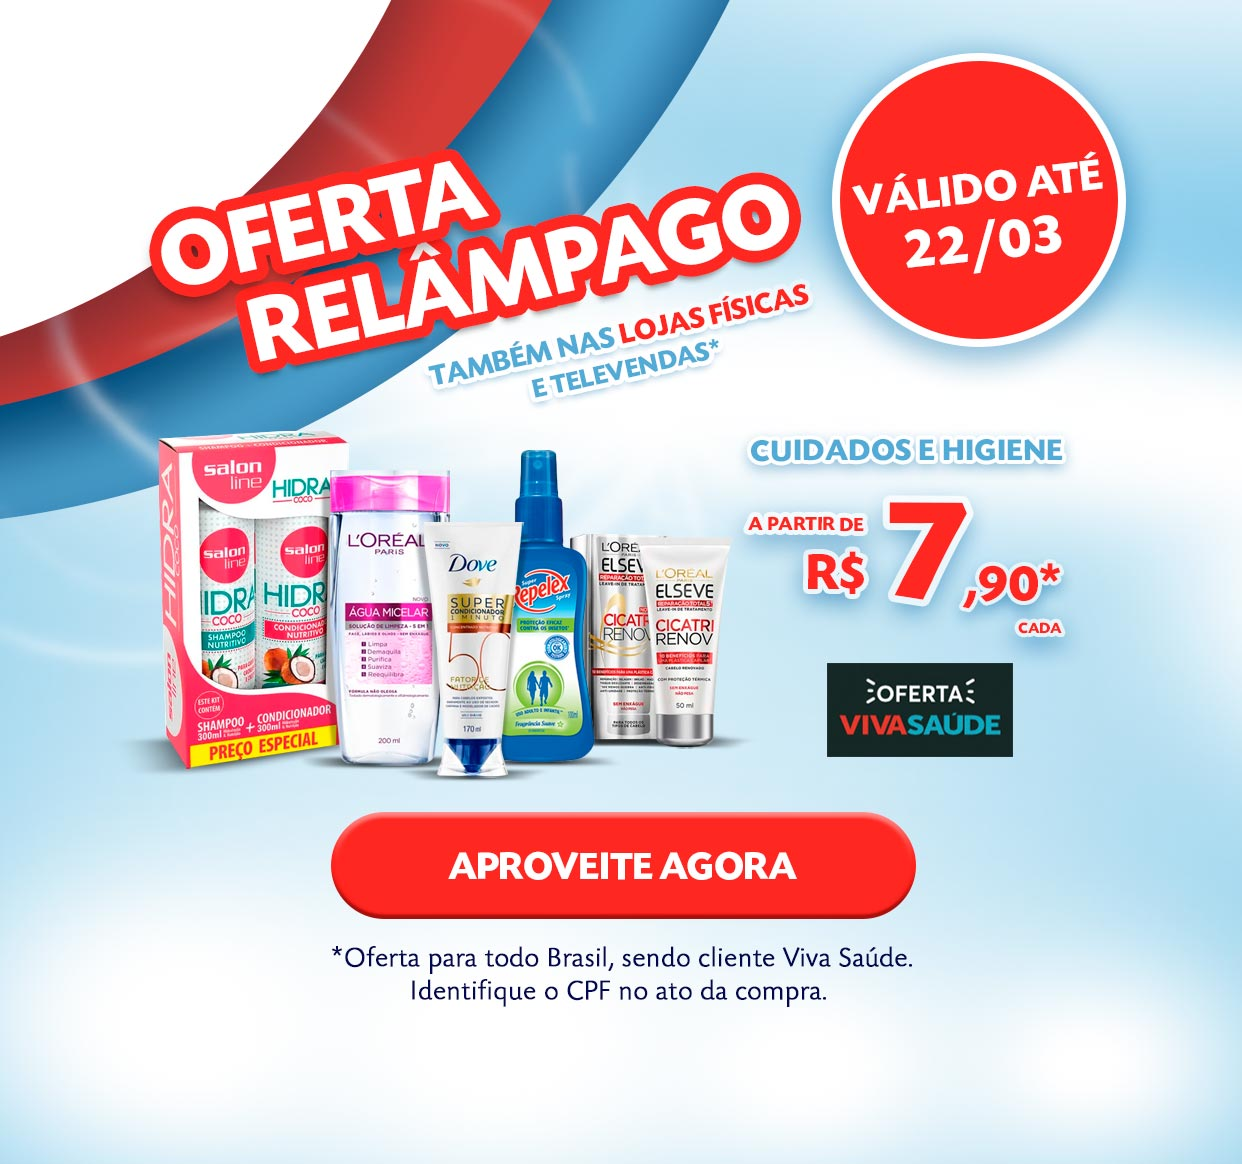 MOBILE OFERTA RELÂMPAGO